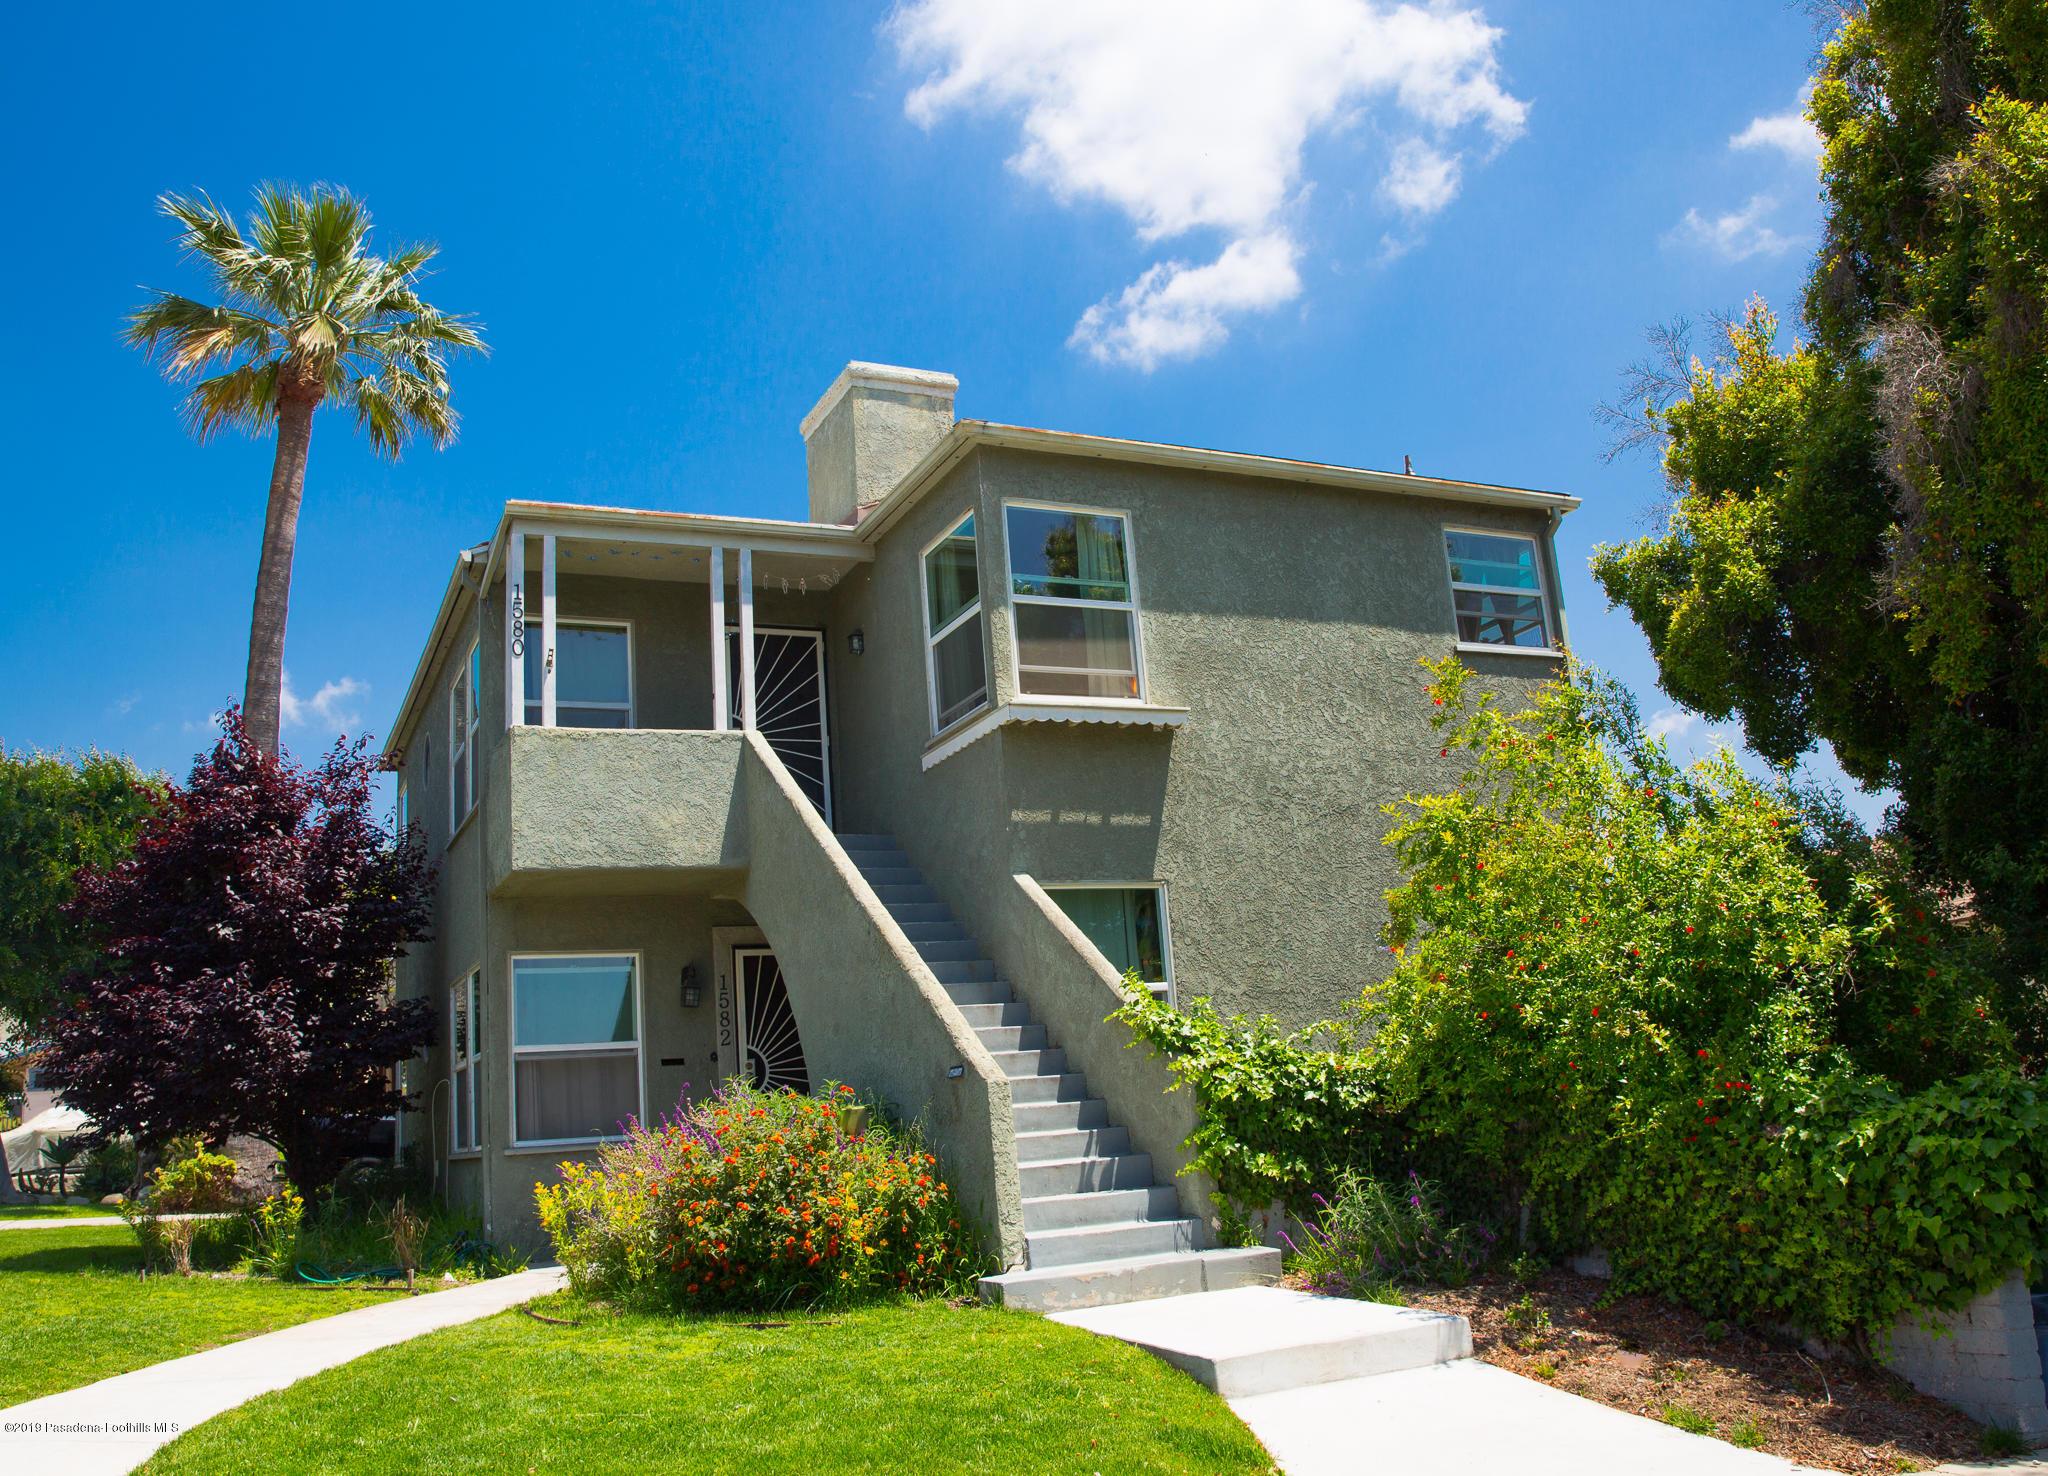 1580 Munson Avenue Los Angeles, CA 90042